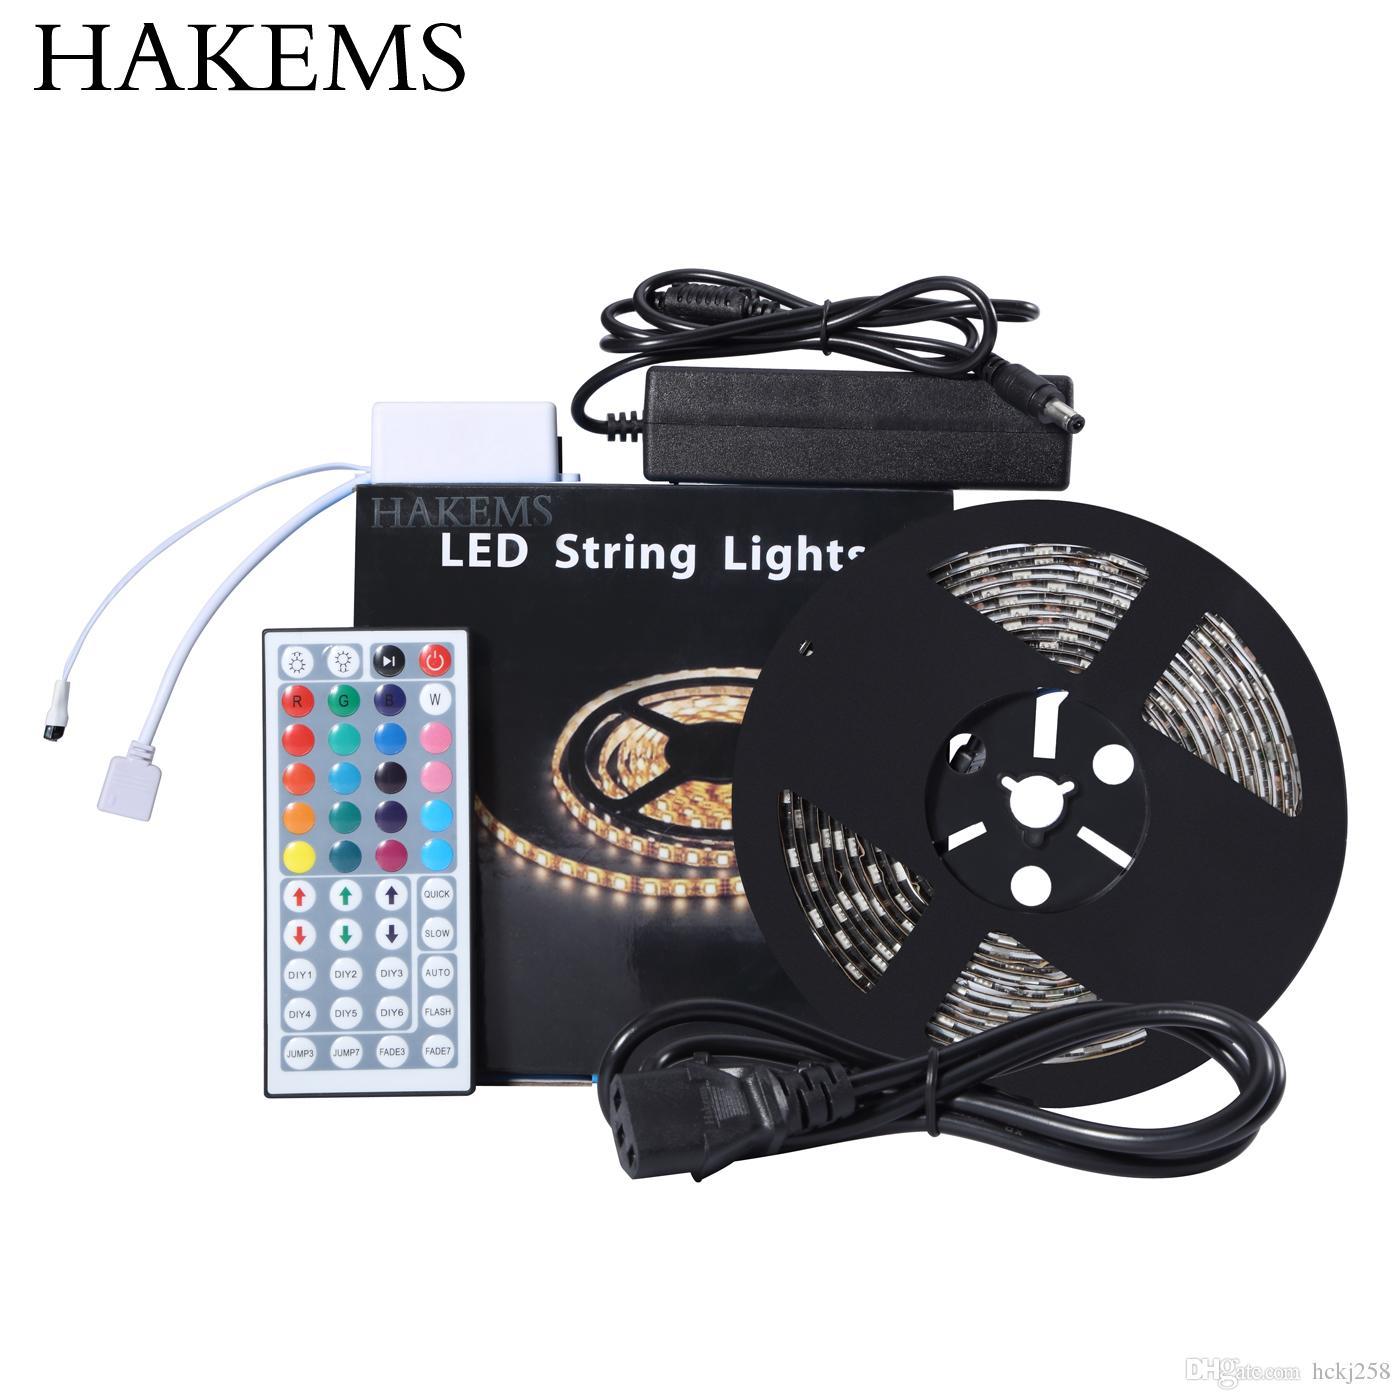 hakems-tm-16-4-ft-led-strip-lights-kit-5m Fabelhafte Led Flex Lichtleisten Set Dekorationen